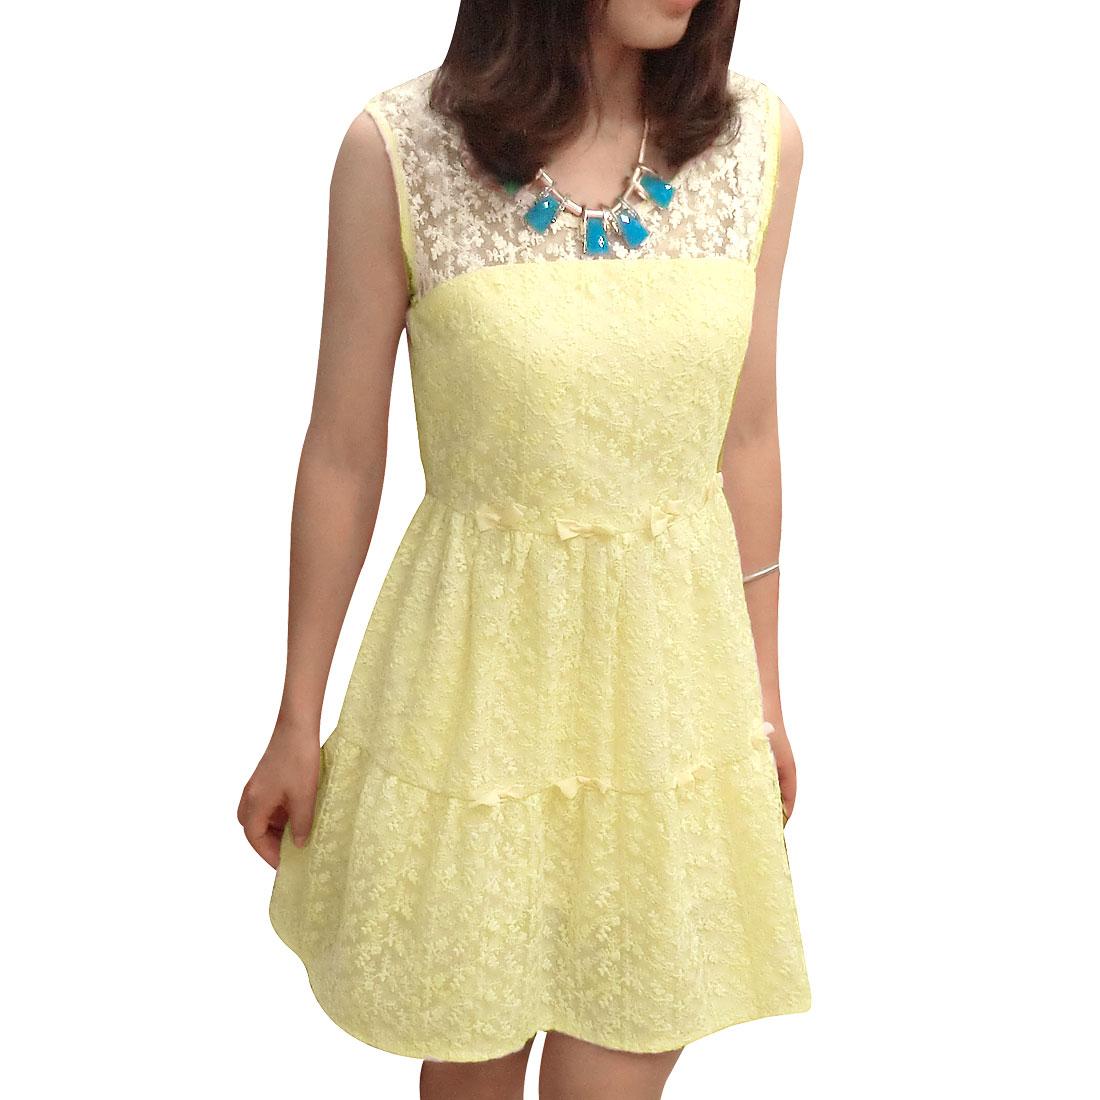 Woman Inner Lining Yellow Flowers Laced Print Elegant Mini A Line Dress XS